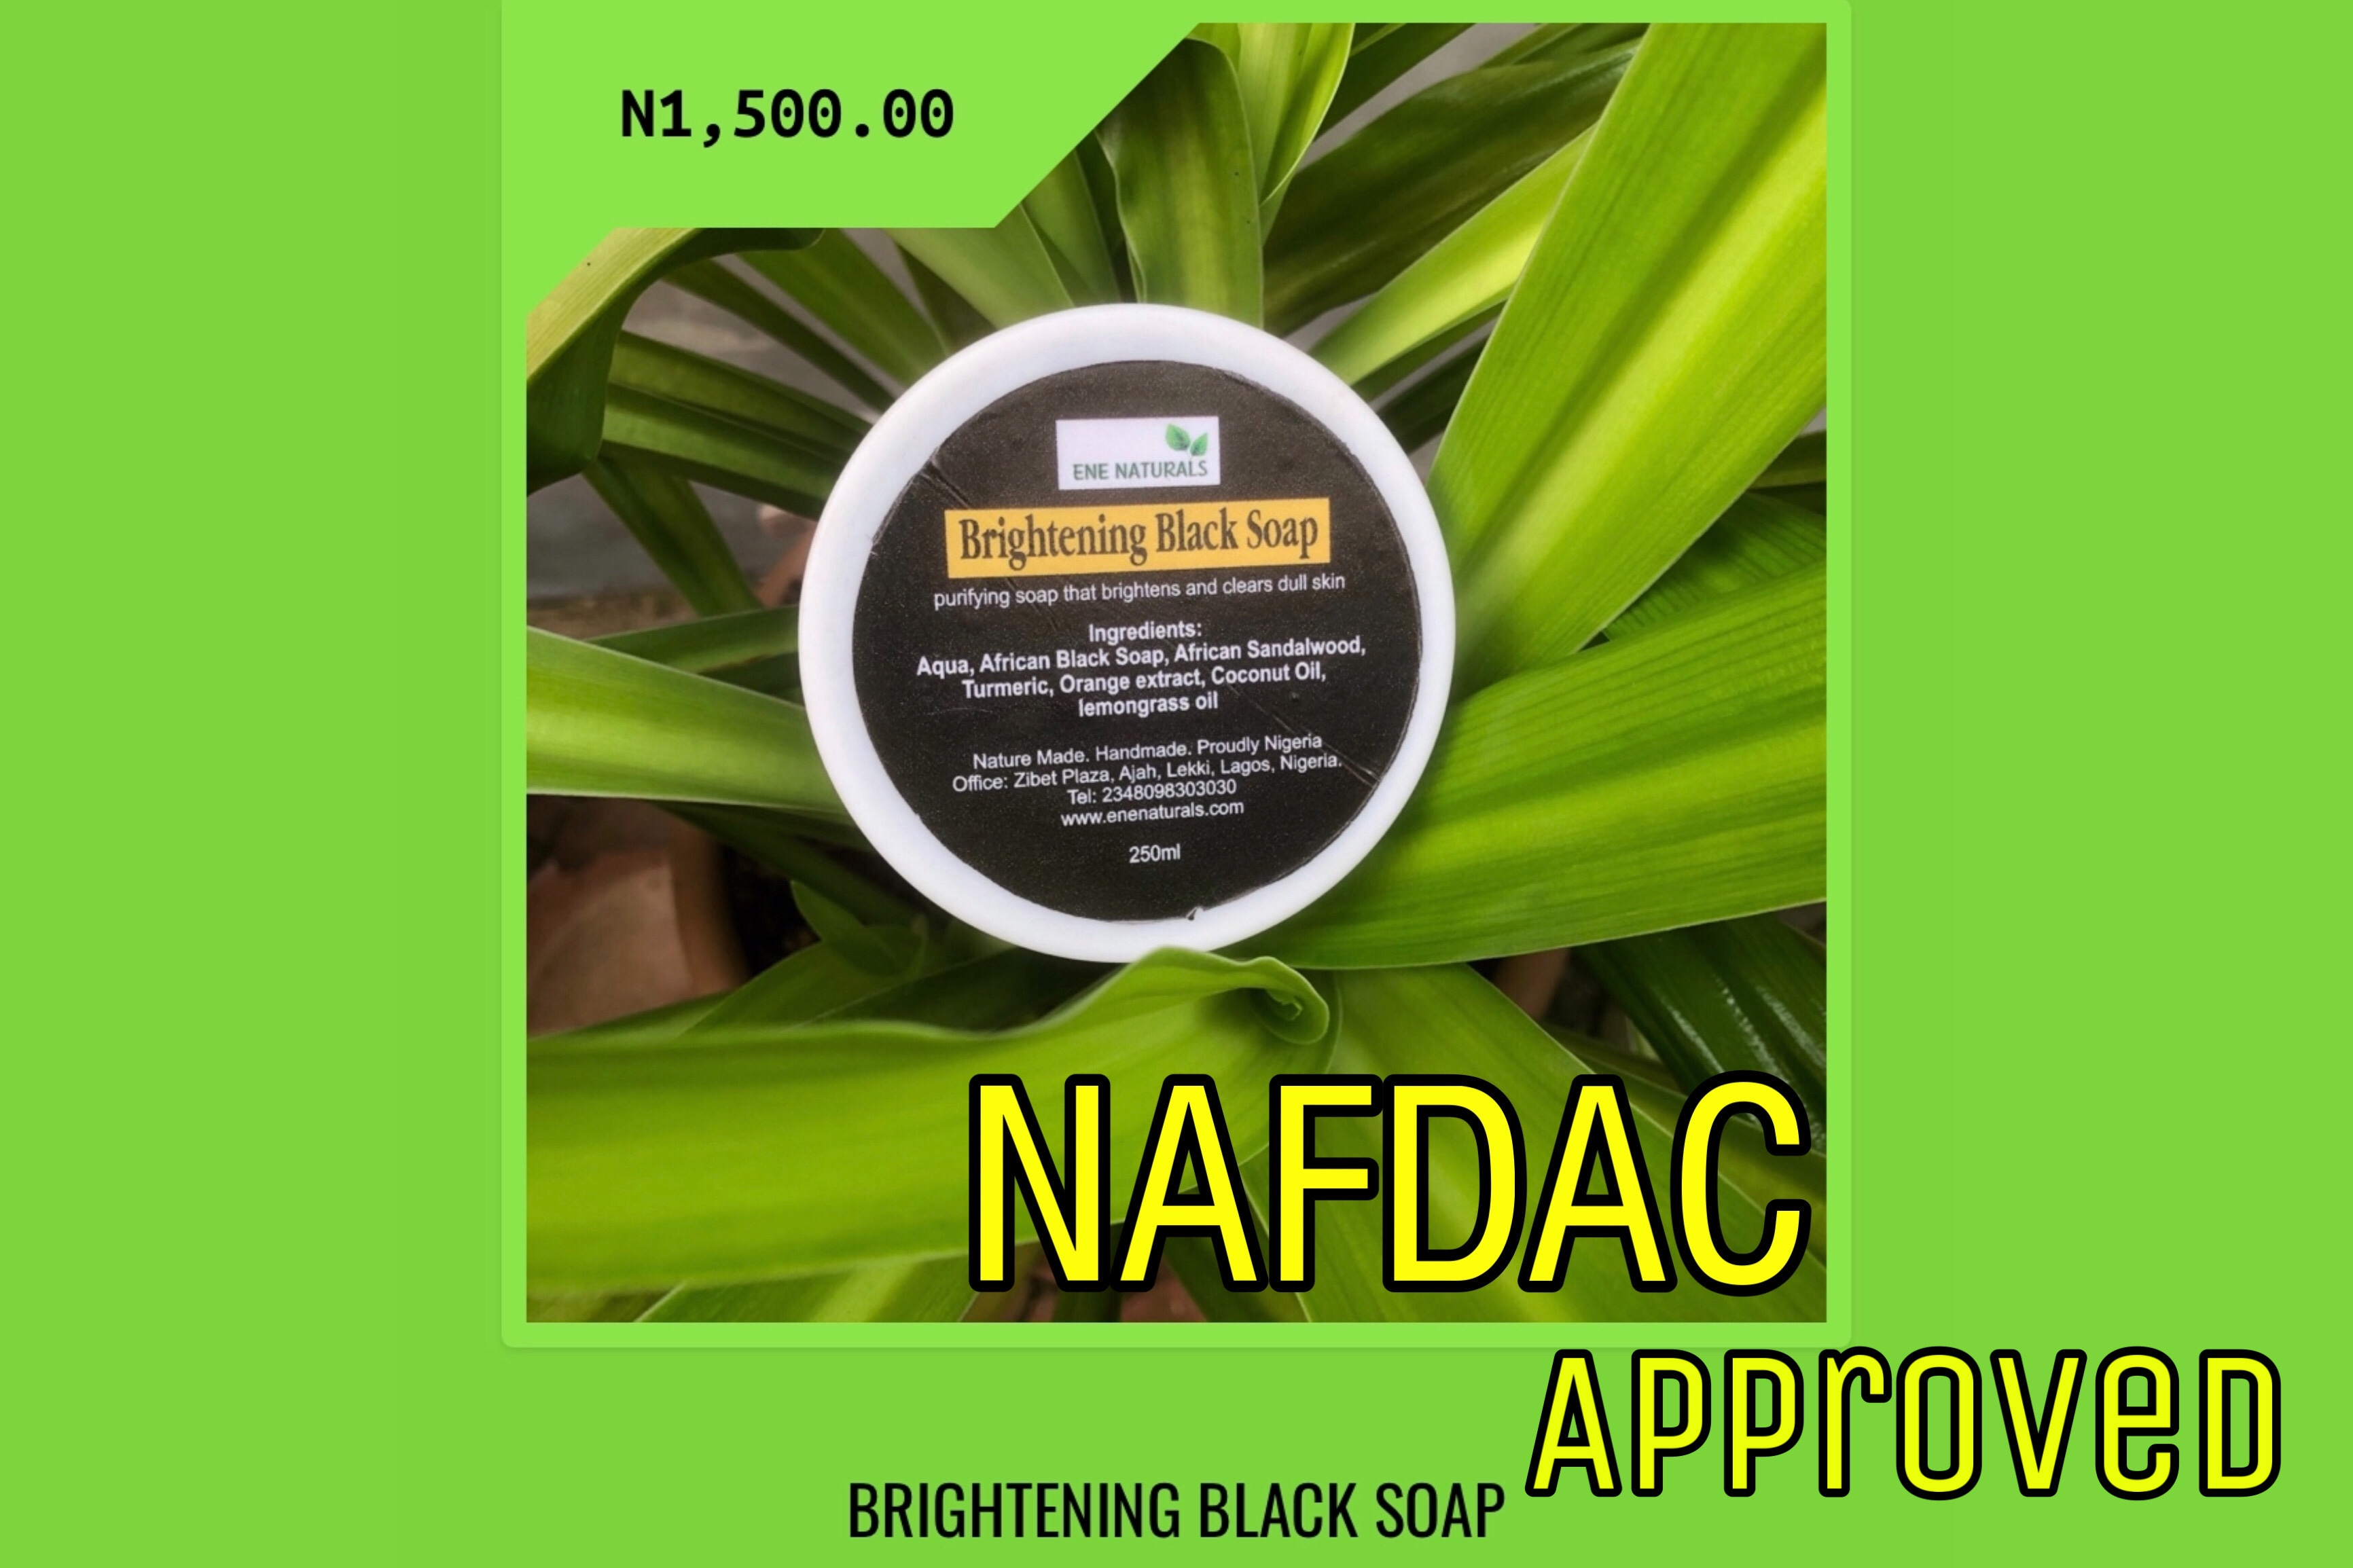 nigerian fda approved black soap